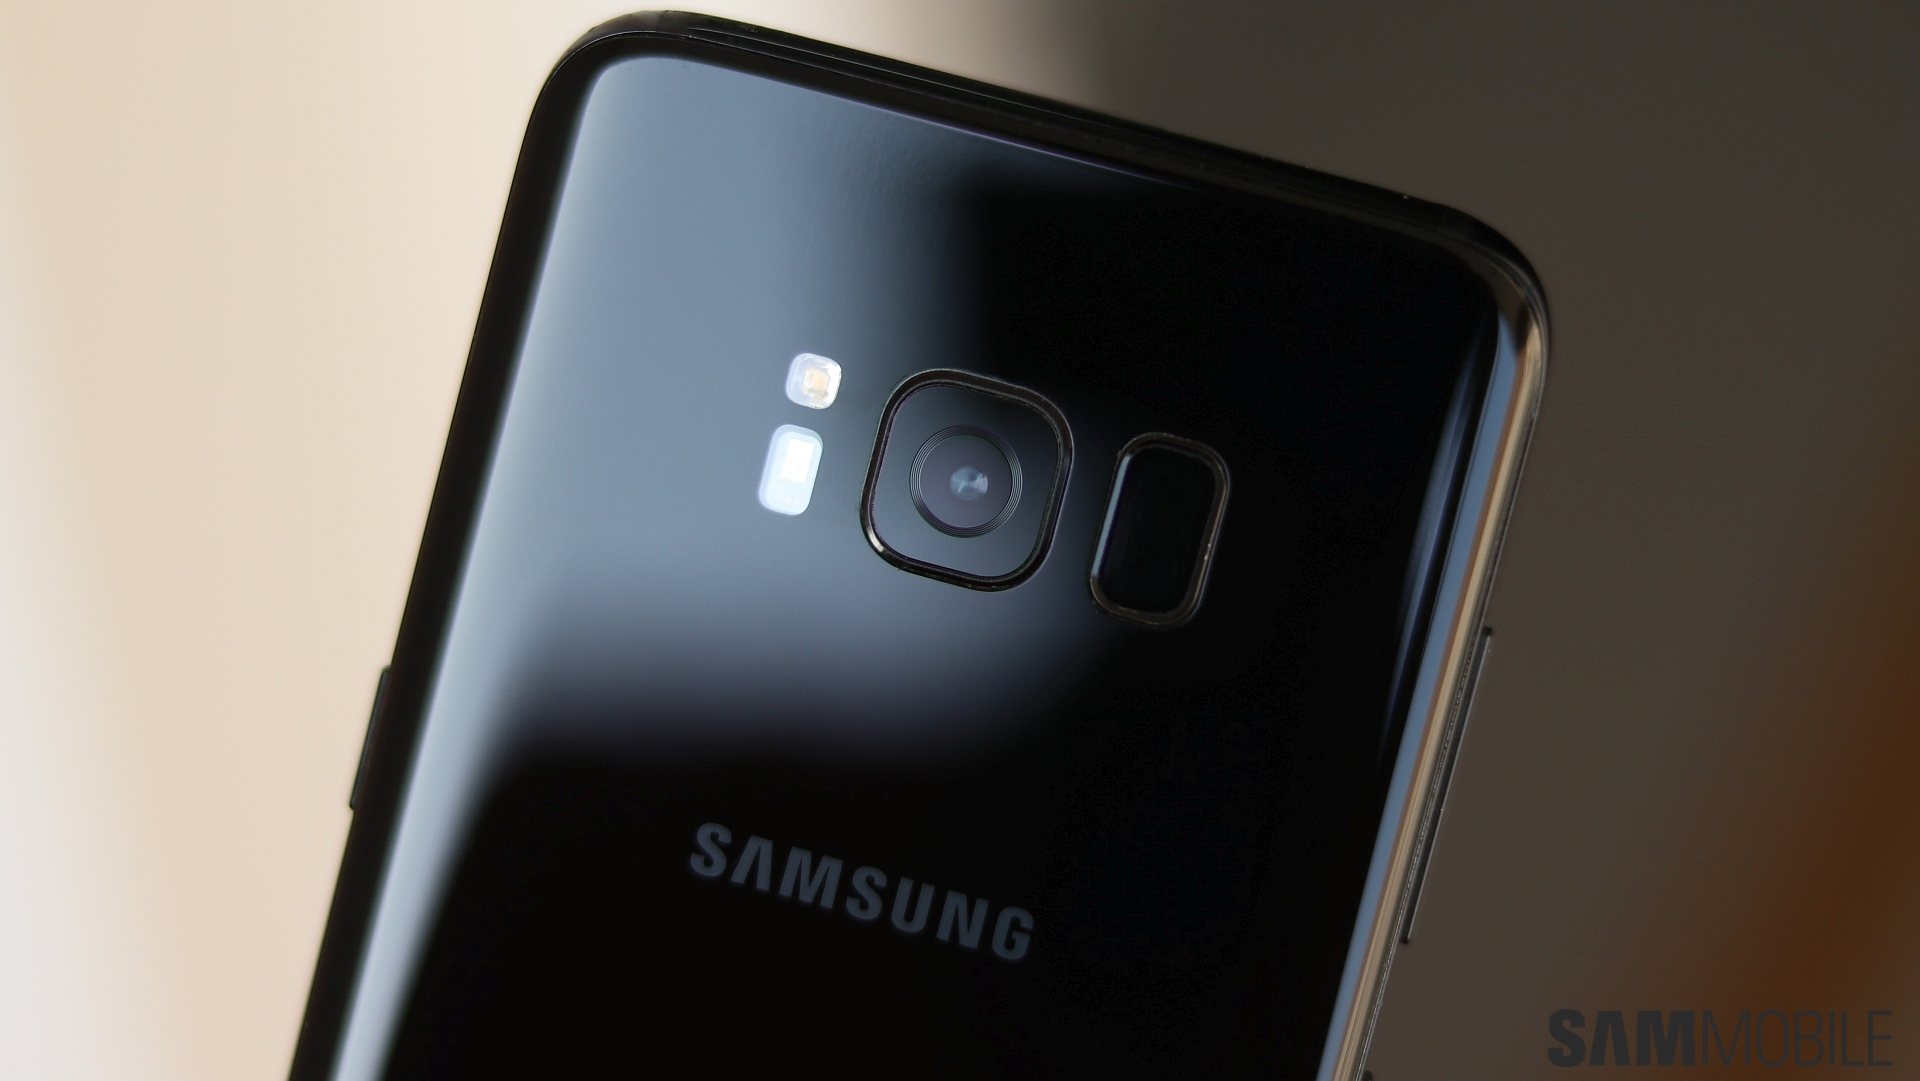 samsung galaxy s8 update rolls out